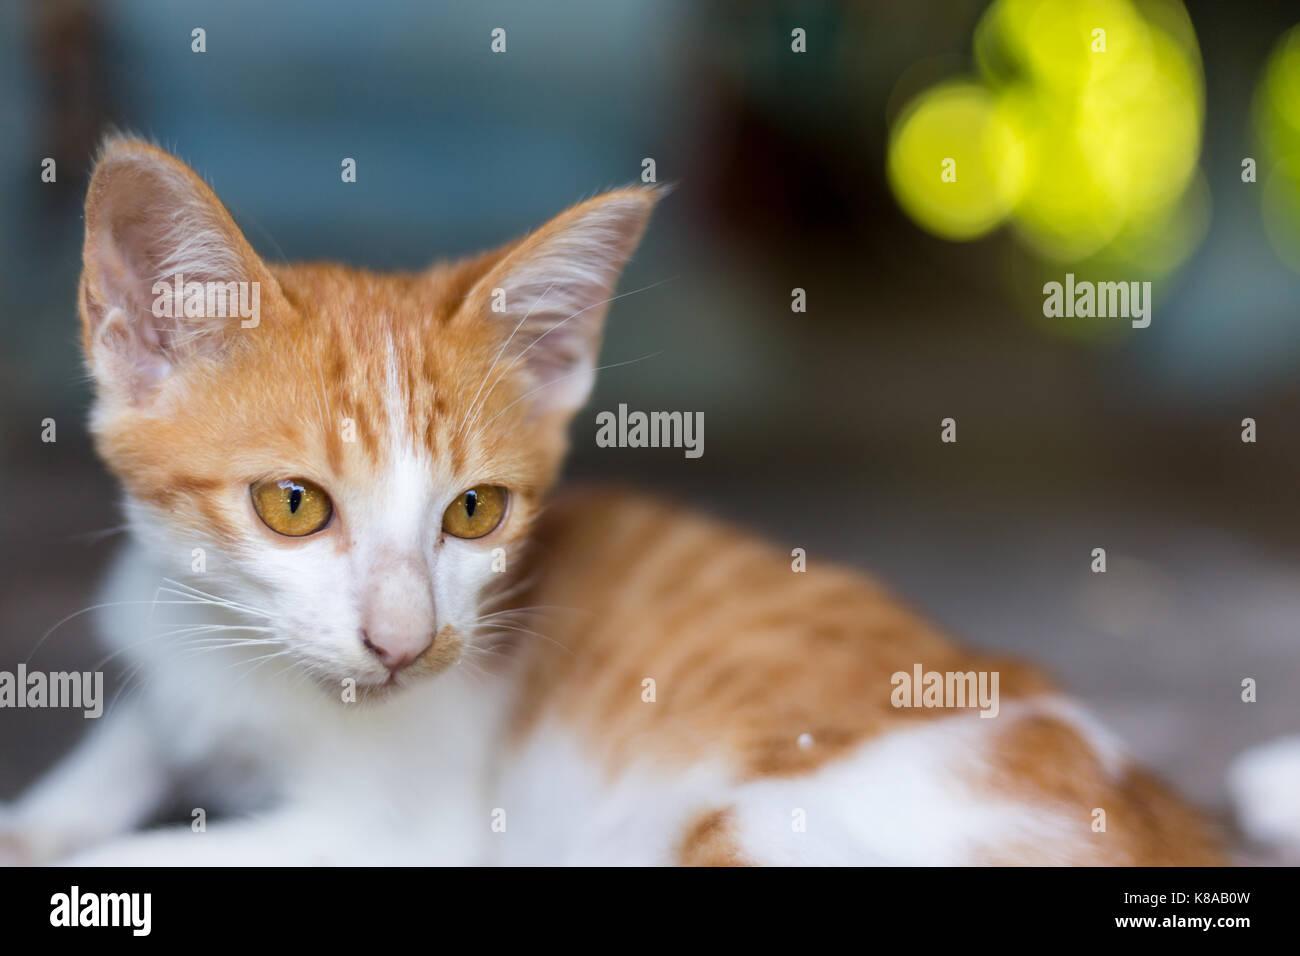 Cat. - Stock Image